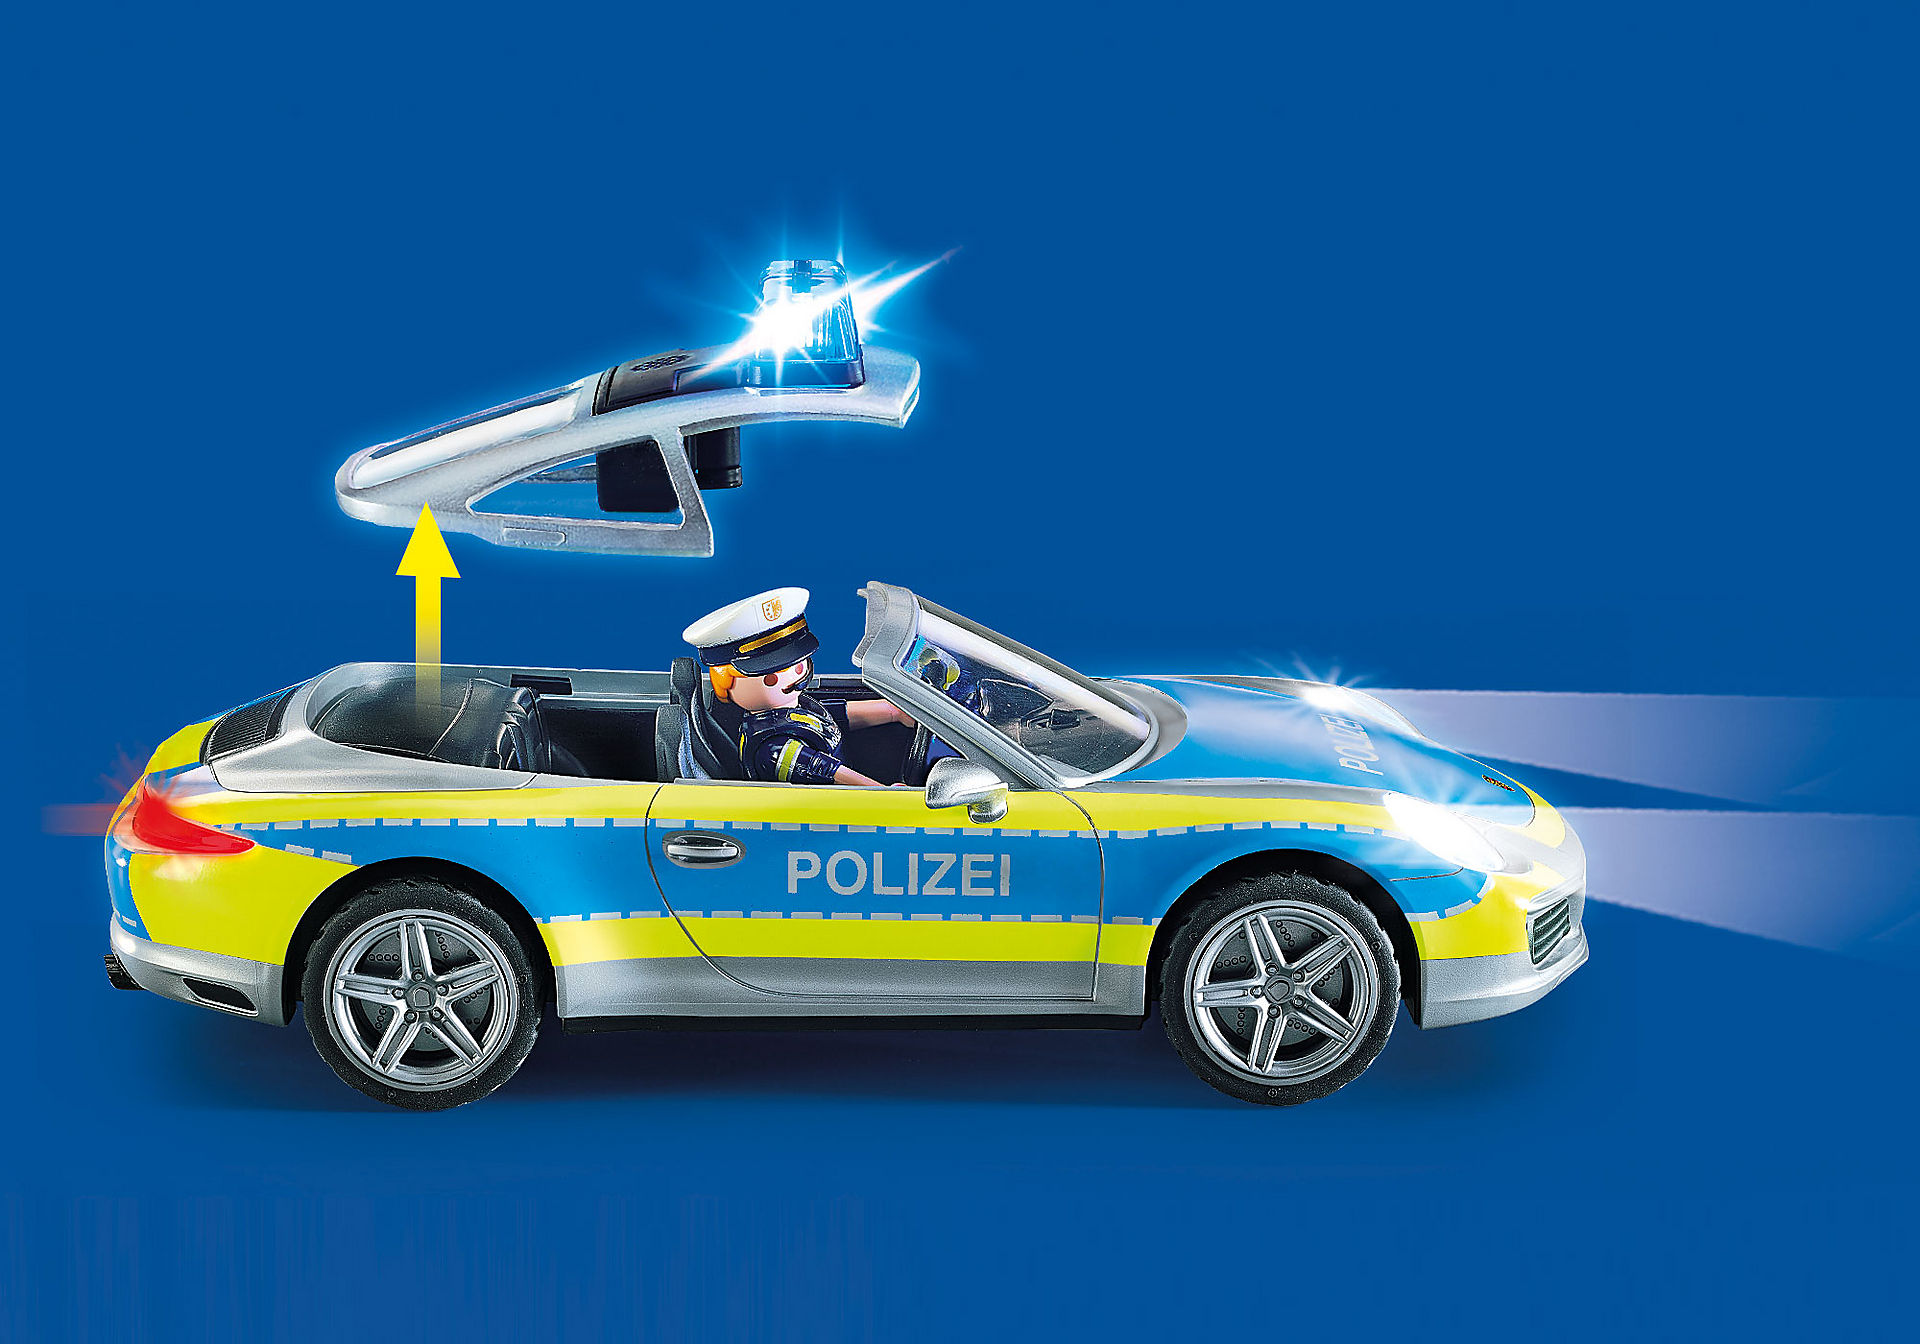 70067 Porsche 911 Carrera 4S Polizei zoom image5